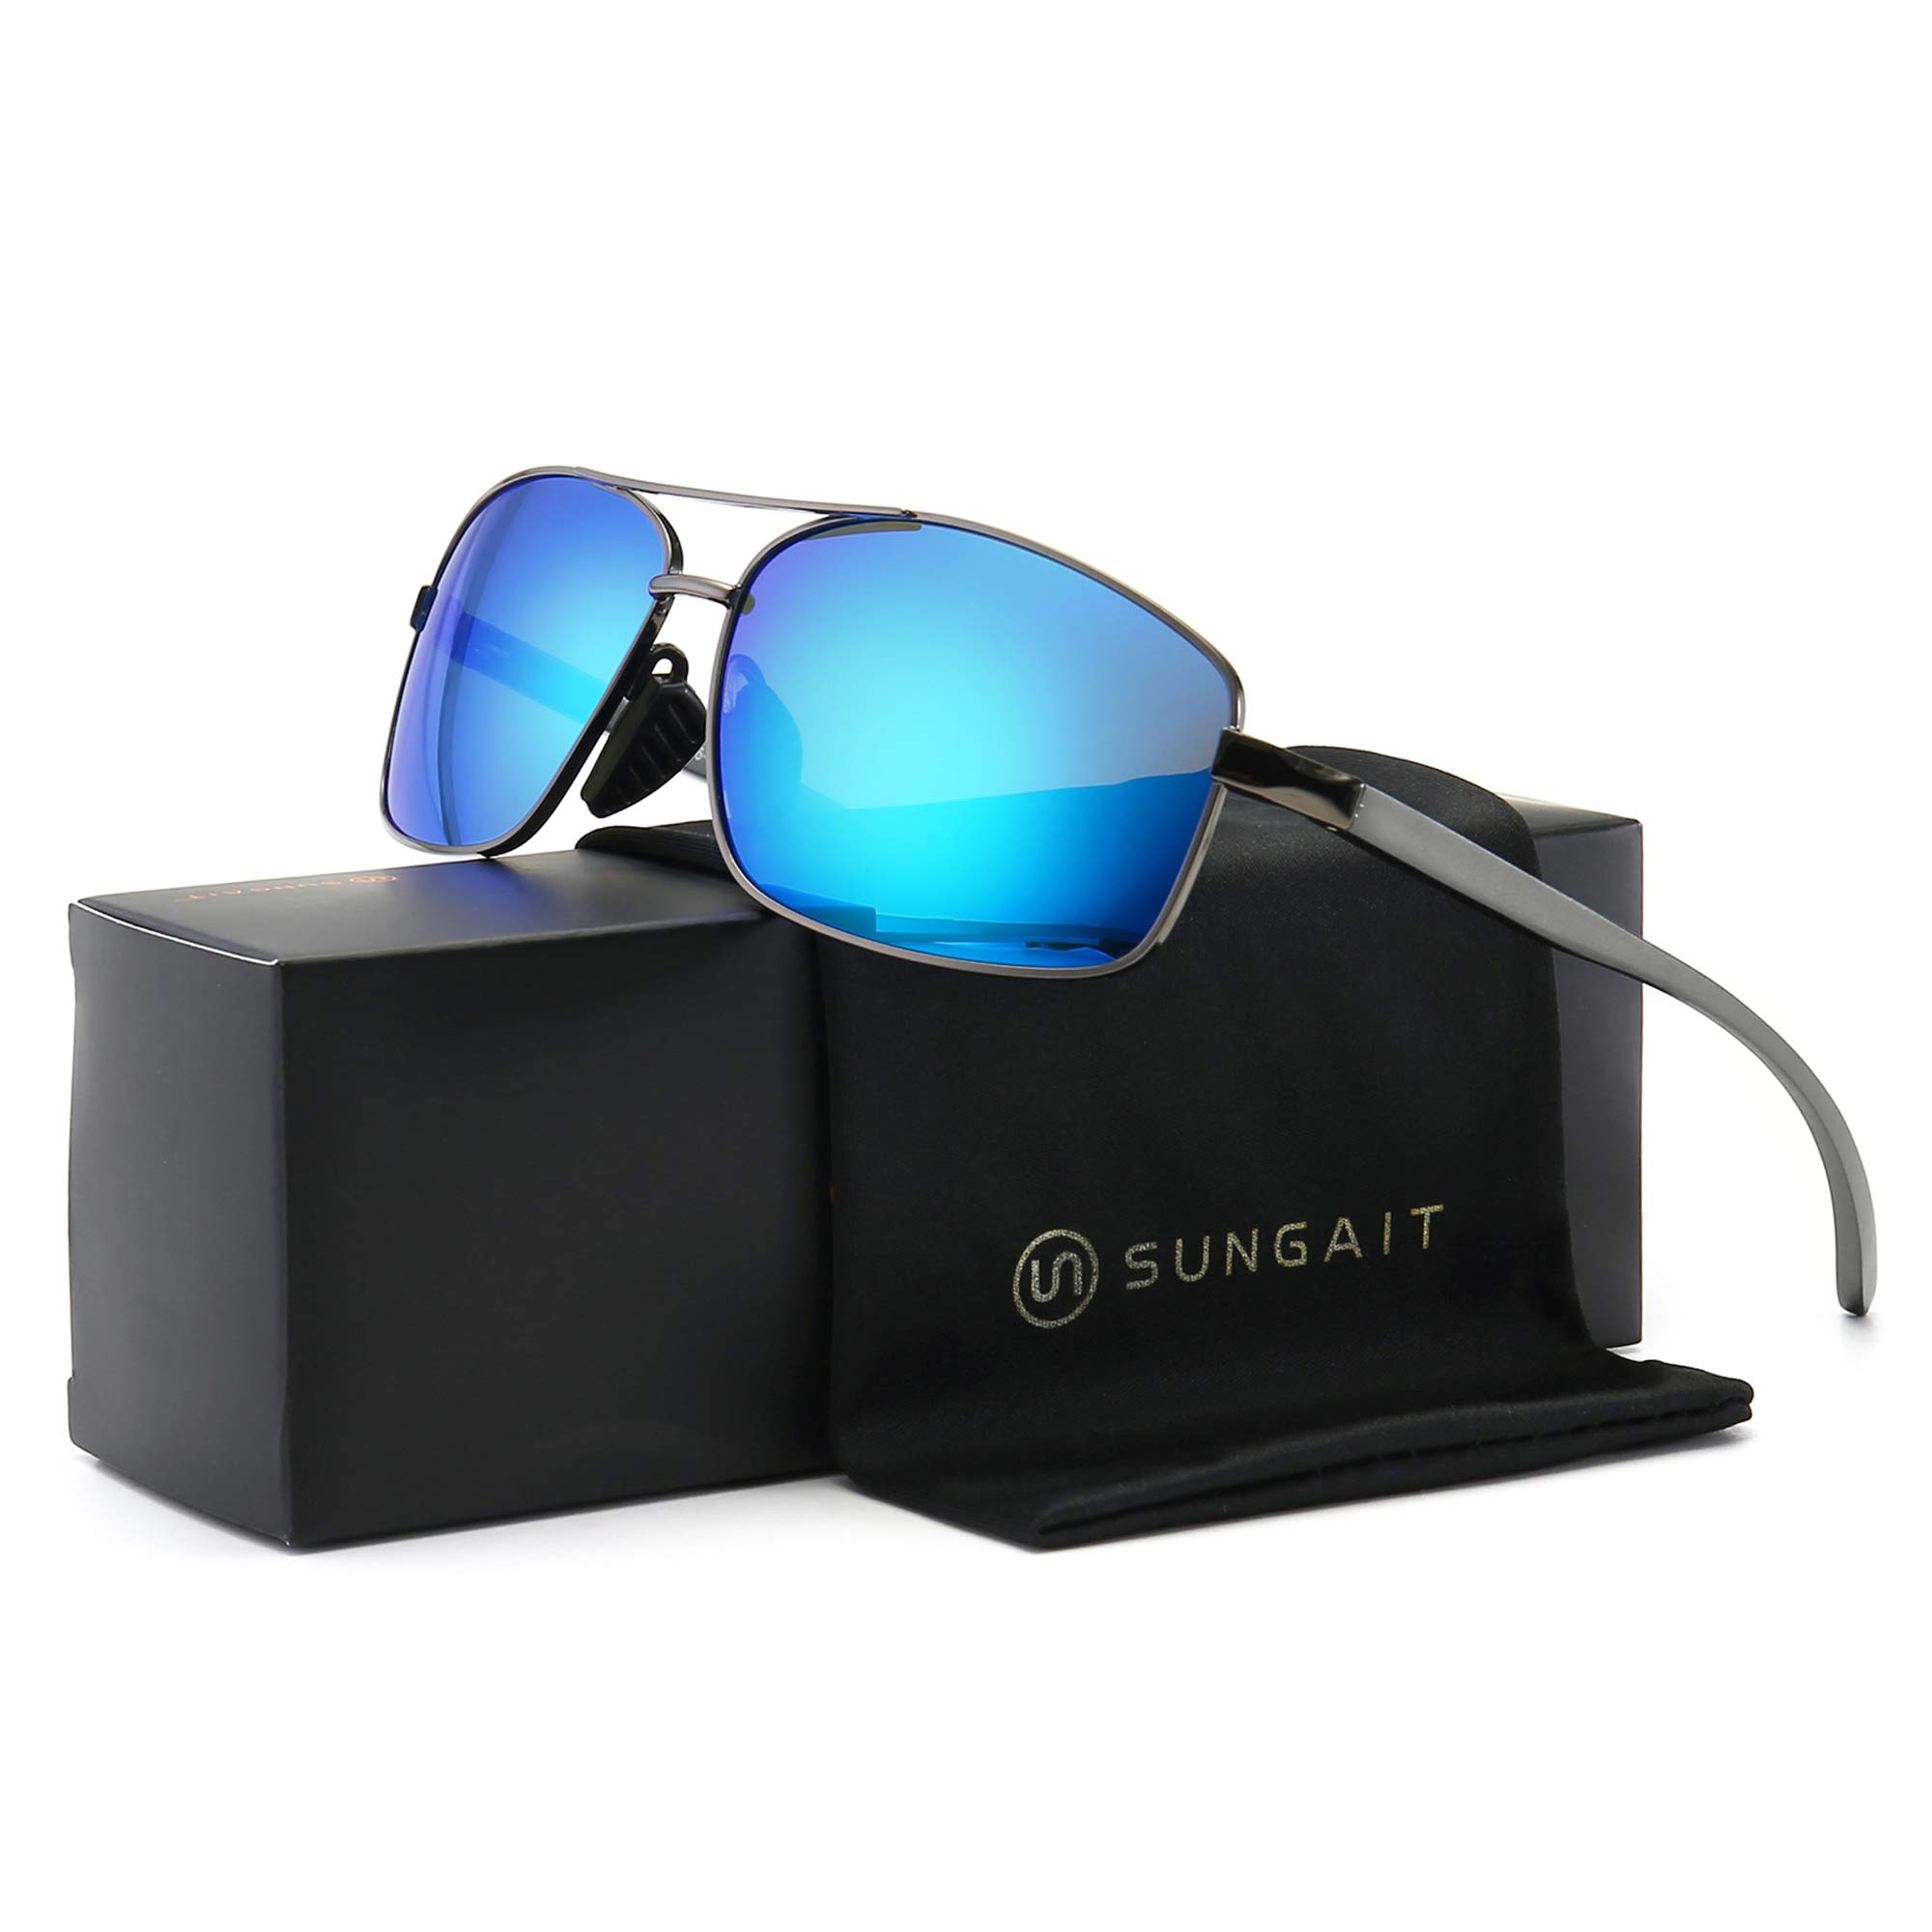 SUNGAIT Ultra Lightweight Rectangular Polarized Sunglasses UV400 Protection (Gunmetal Frame Blue Mirror Lens, 62) Metal Frame 2458 QKLA by SUNGAIT